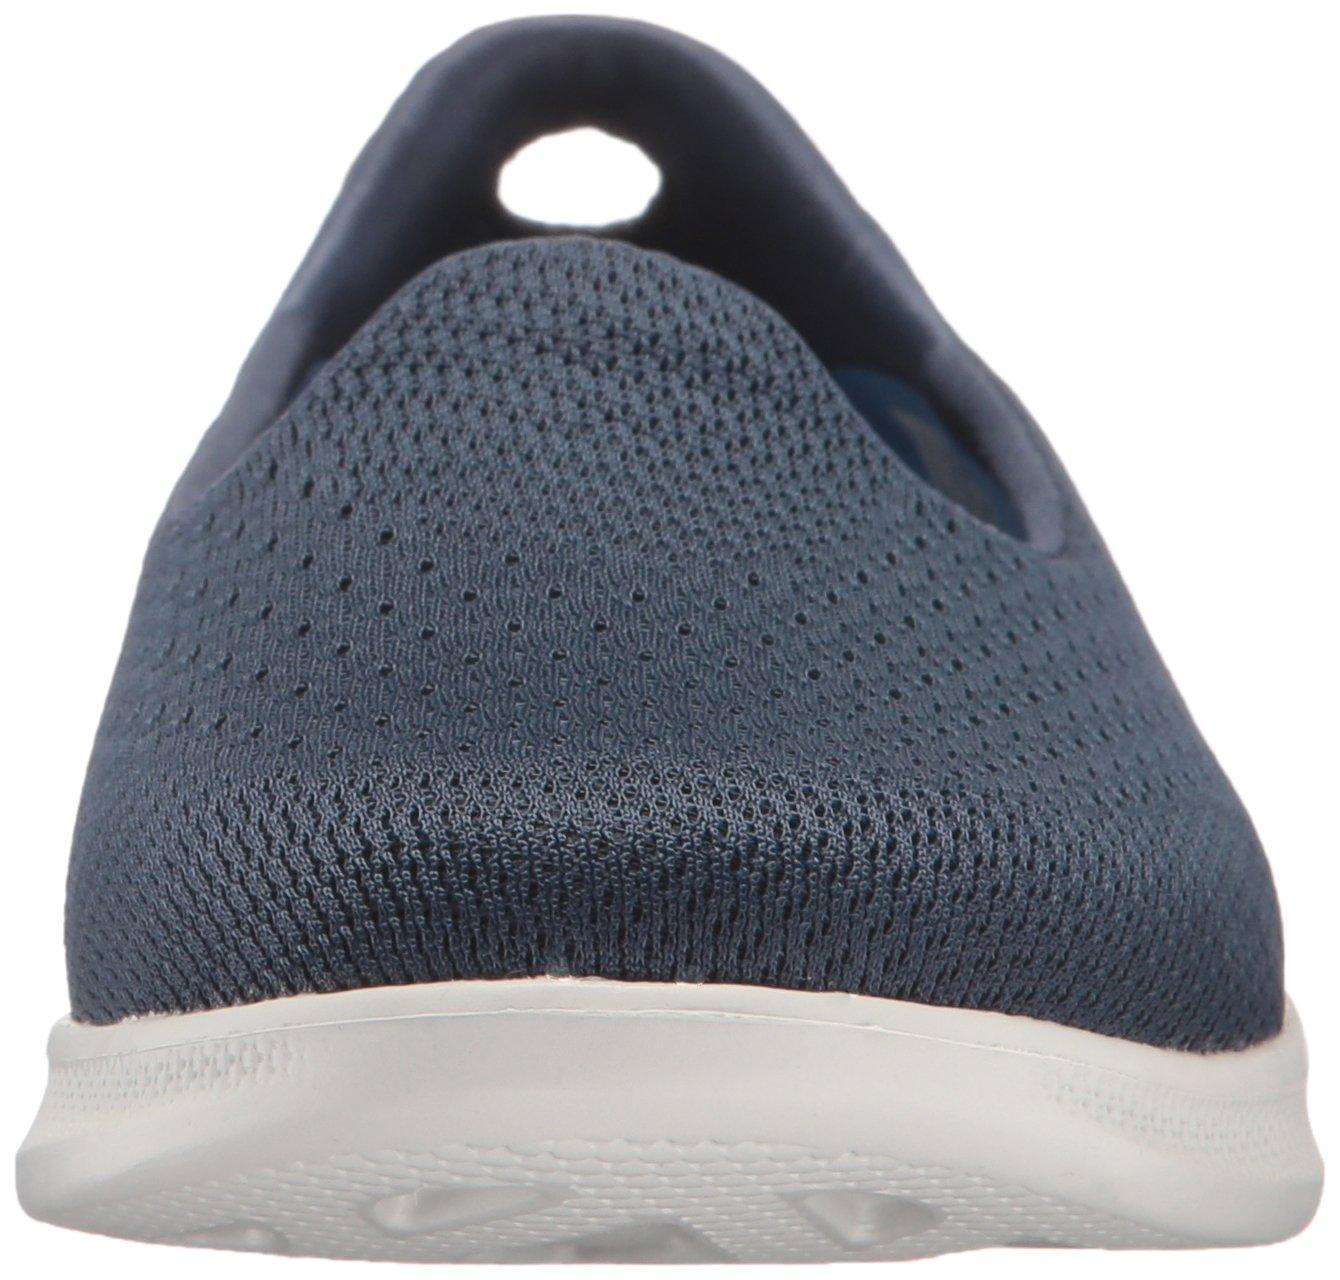 Skechers Performance Women's Go Step Lite Slip-on Walking Shoe B01IIBSZ2C 8 B(M) US Navy/Gray